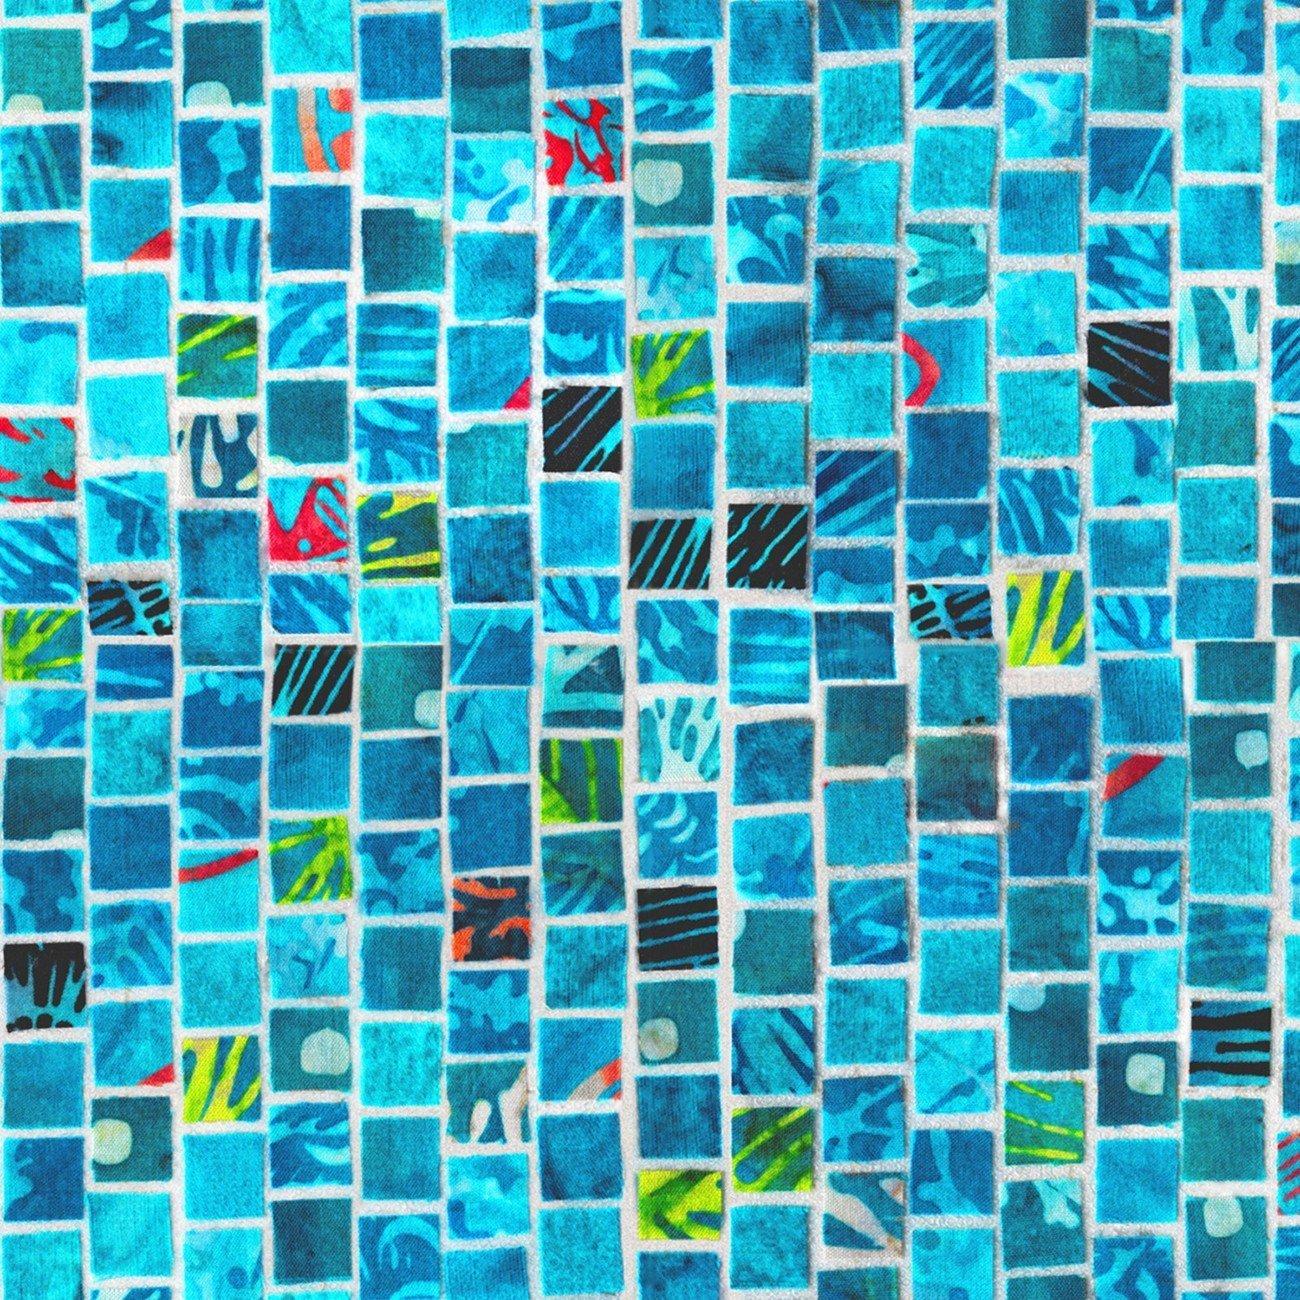 Mosaic by Hoffman